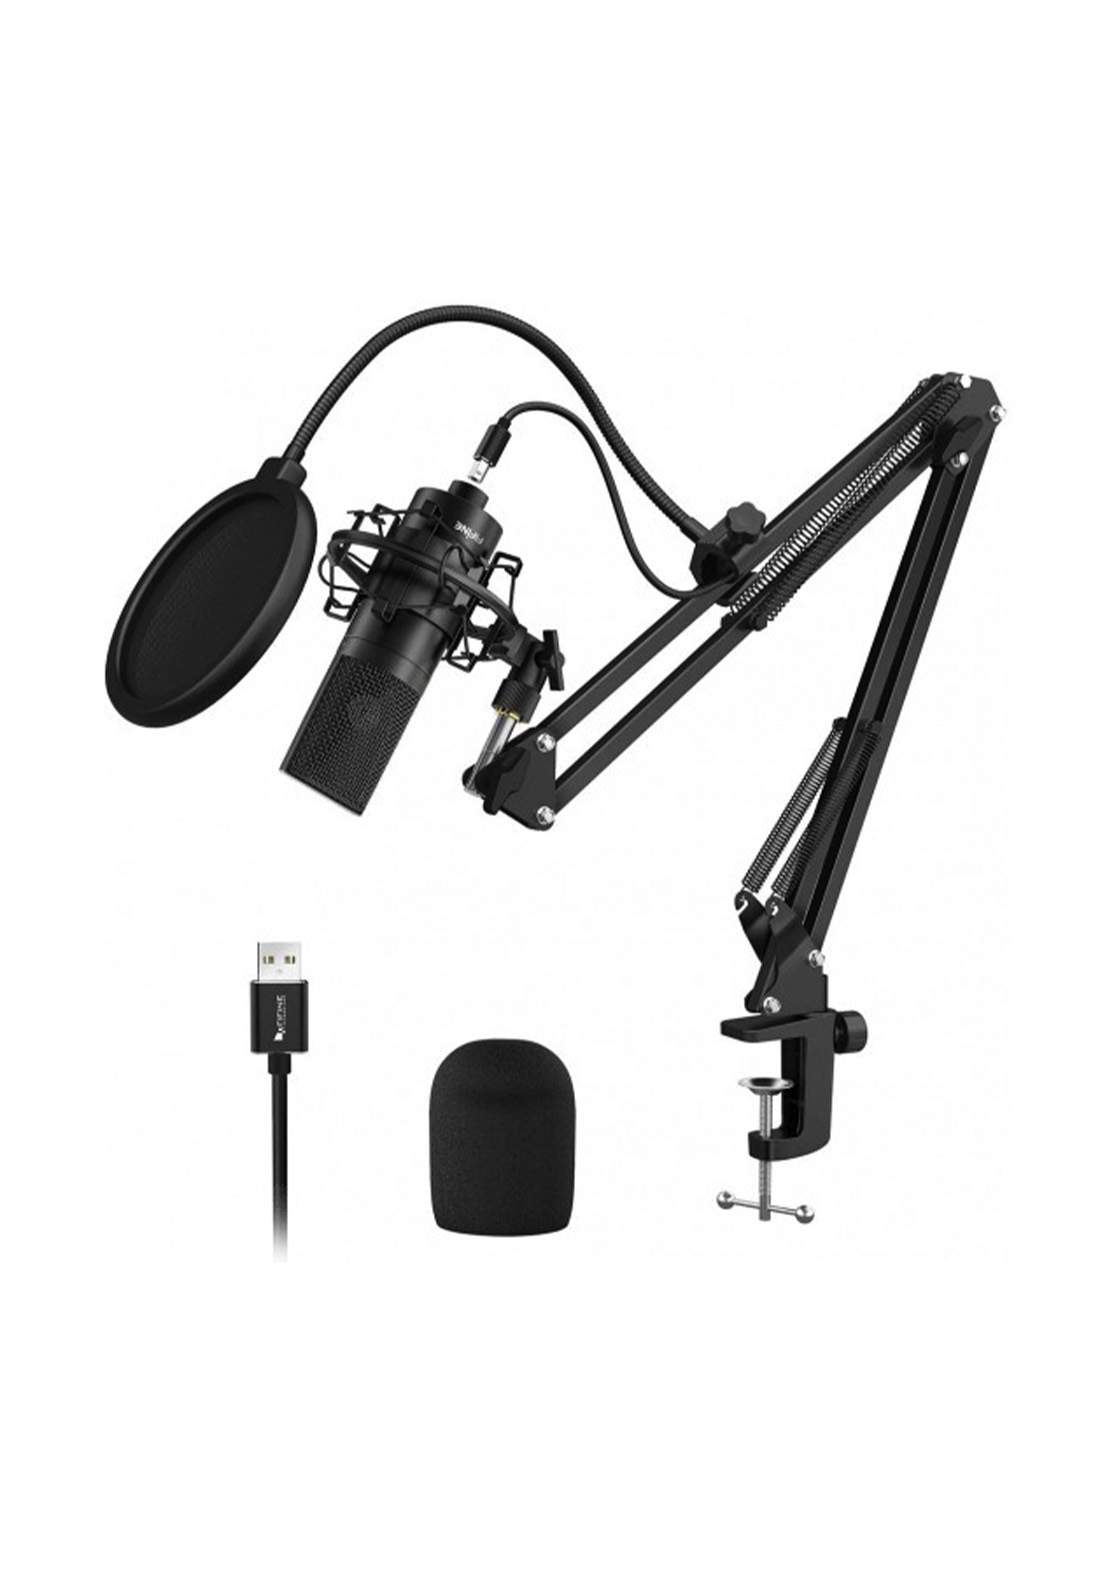 Fifine K780  Recording USB Microphone With Arm Stand-Black  مايكروفون